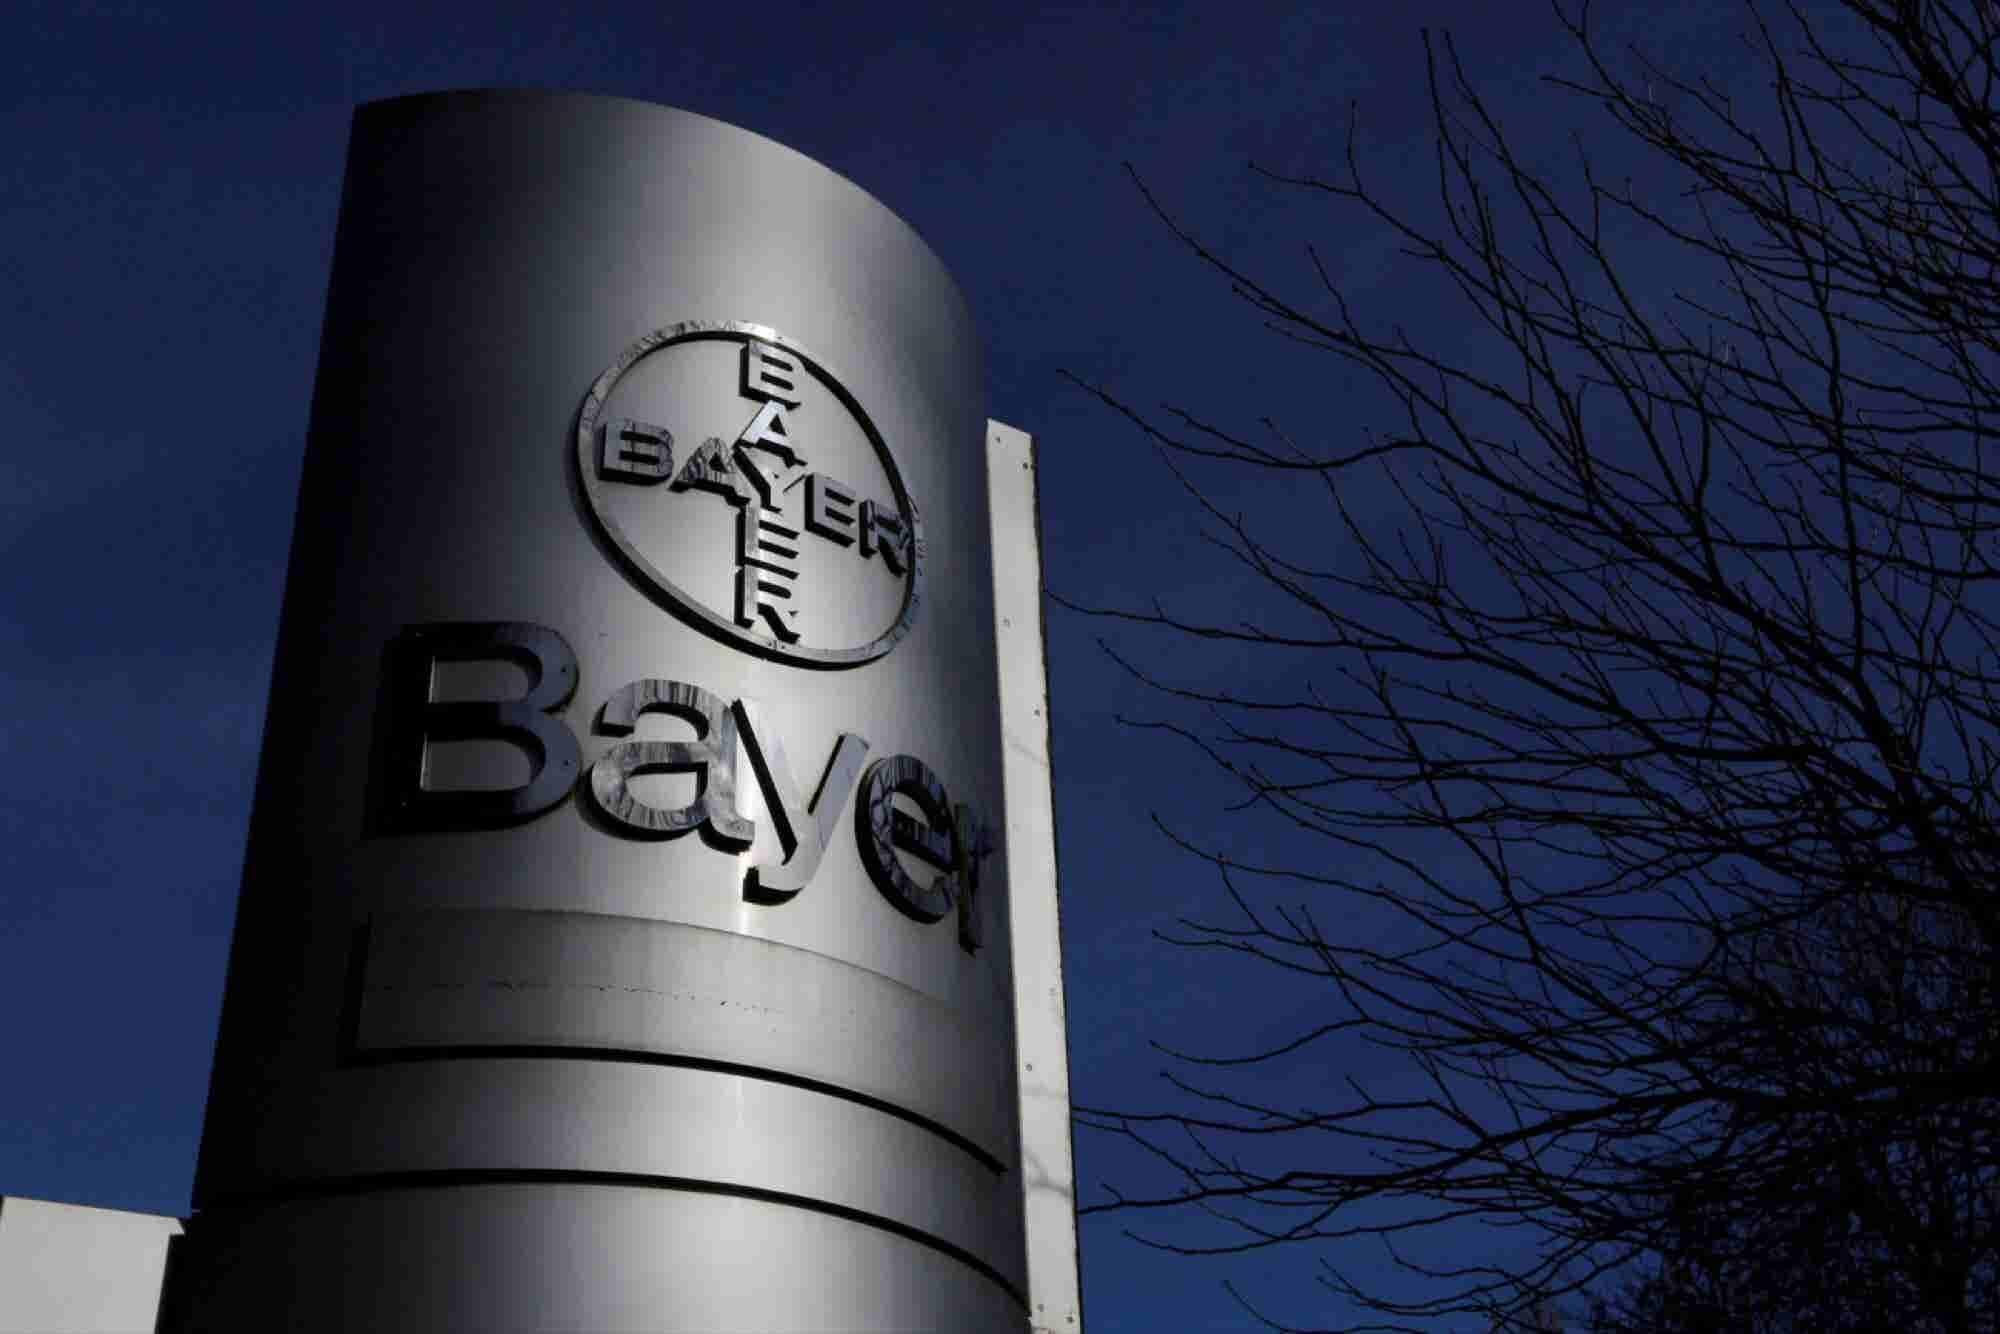 Bayer Clinches Monsanto With Improved $66 Billion Bid